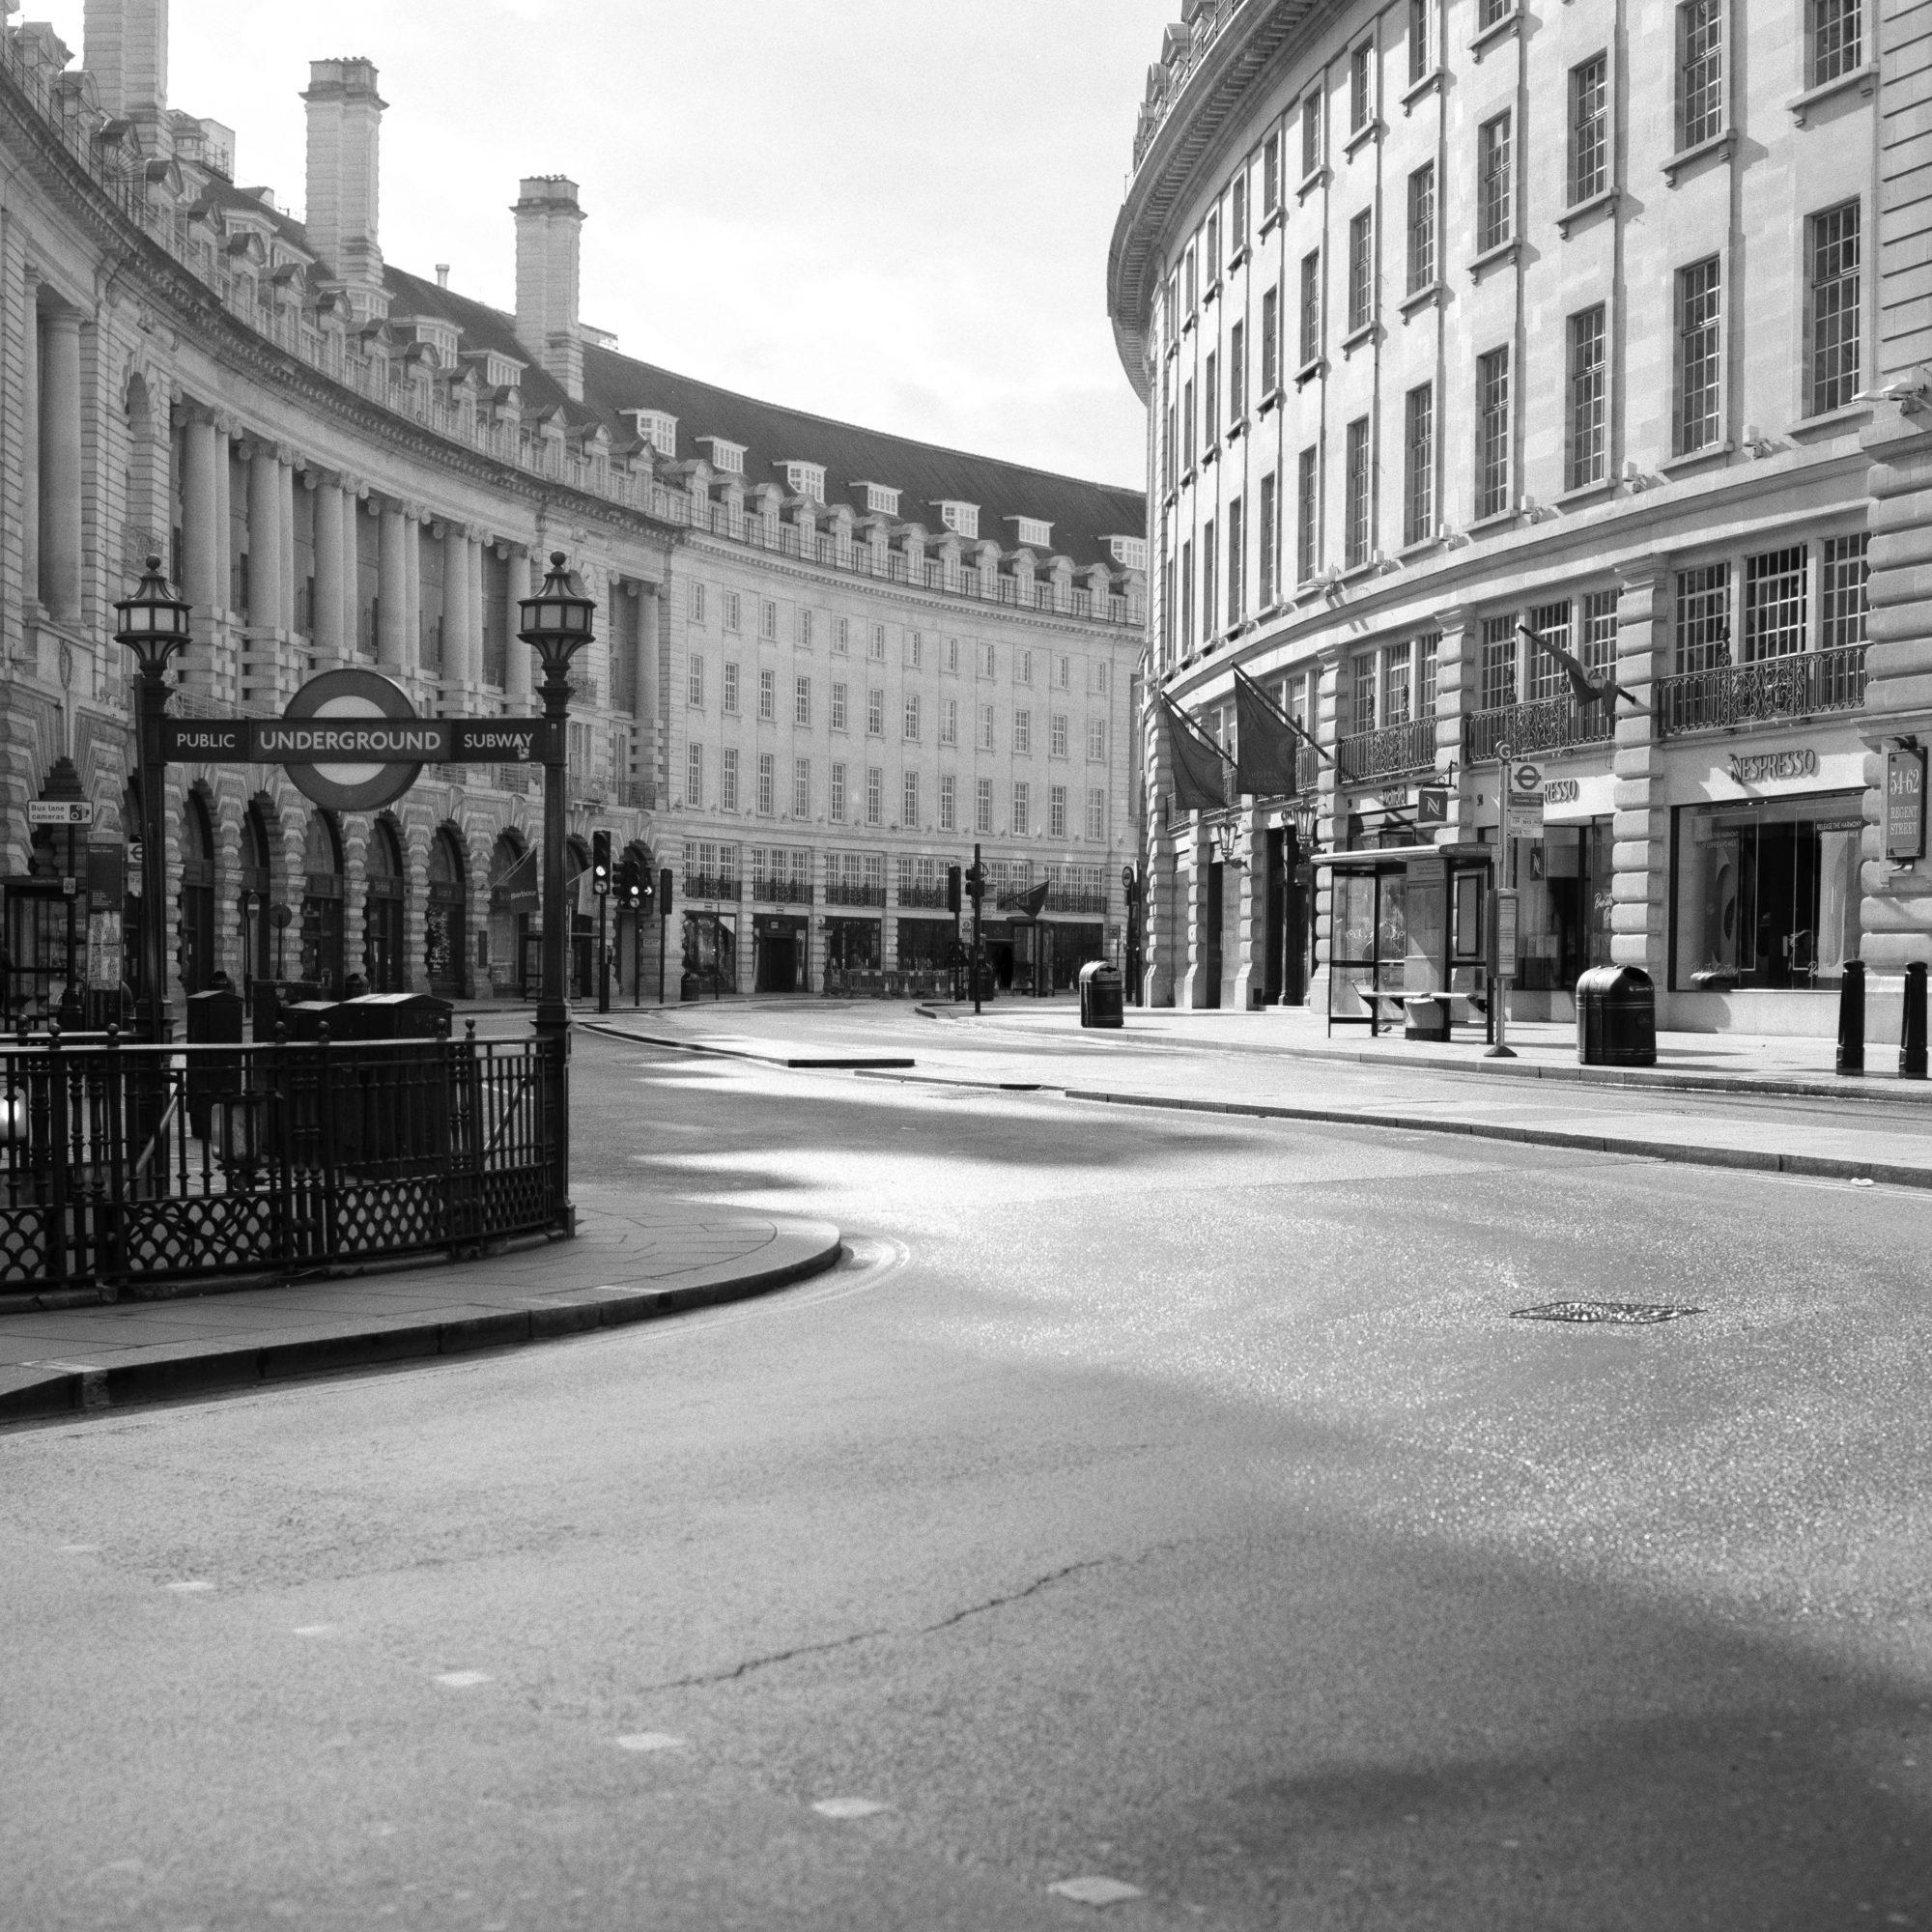 Regent Street, London (Pic: Giacomo Mantovani)